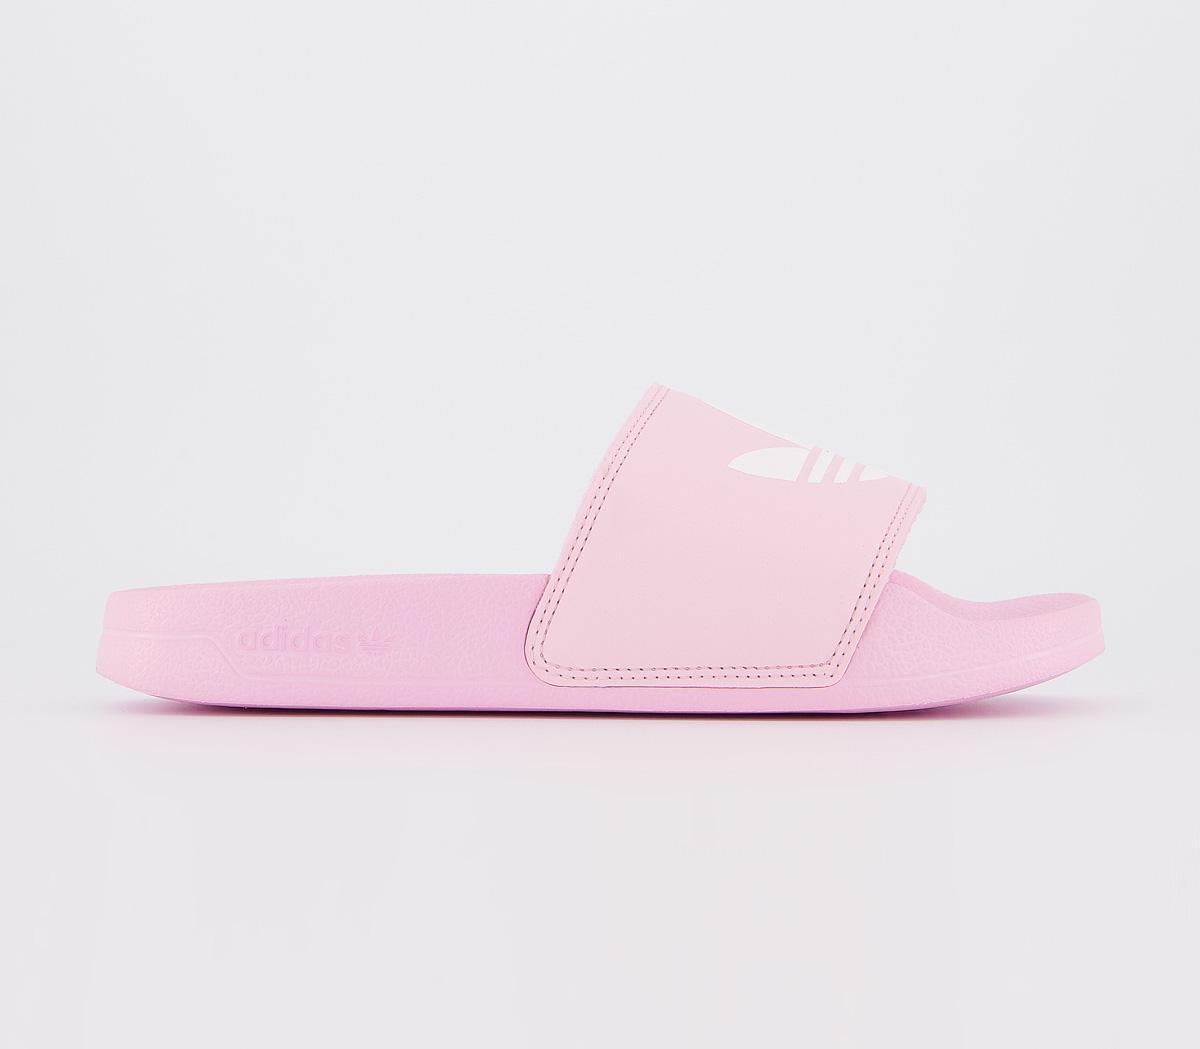 adidas Adilette Sliders Pink White Pink